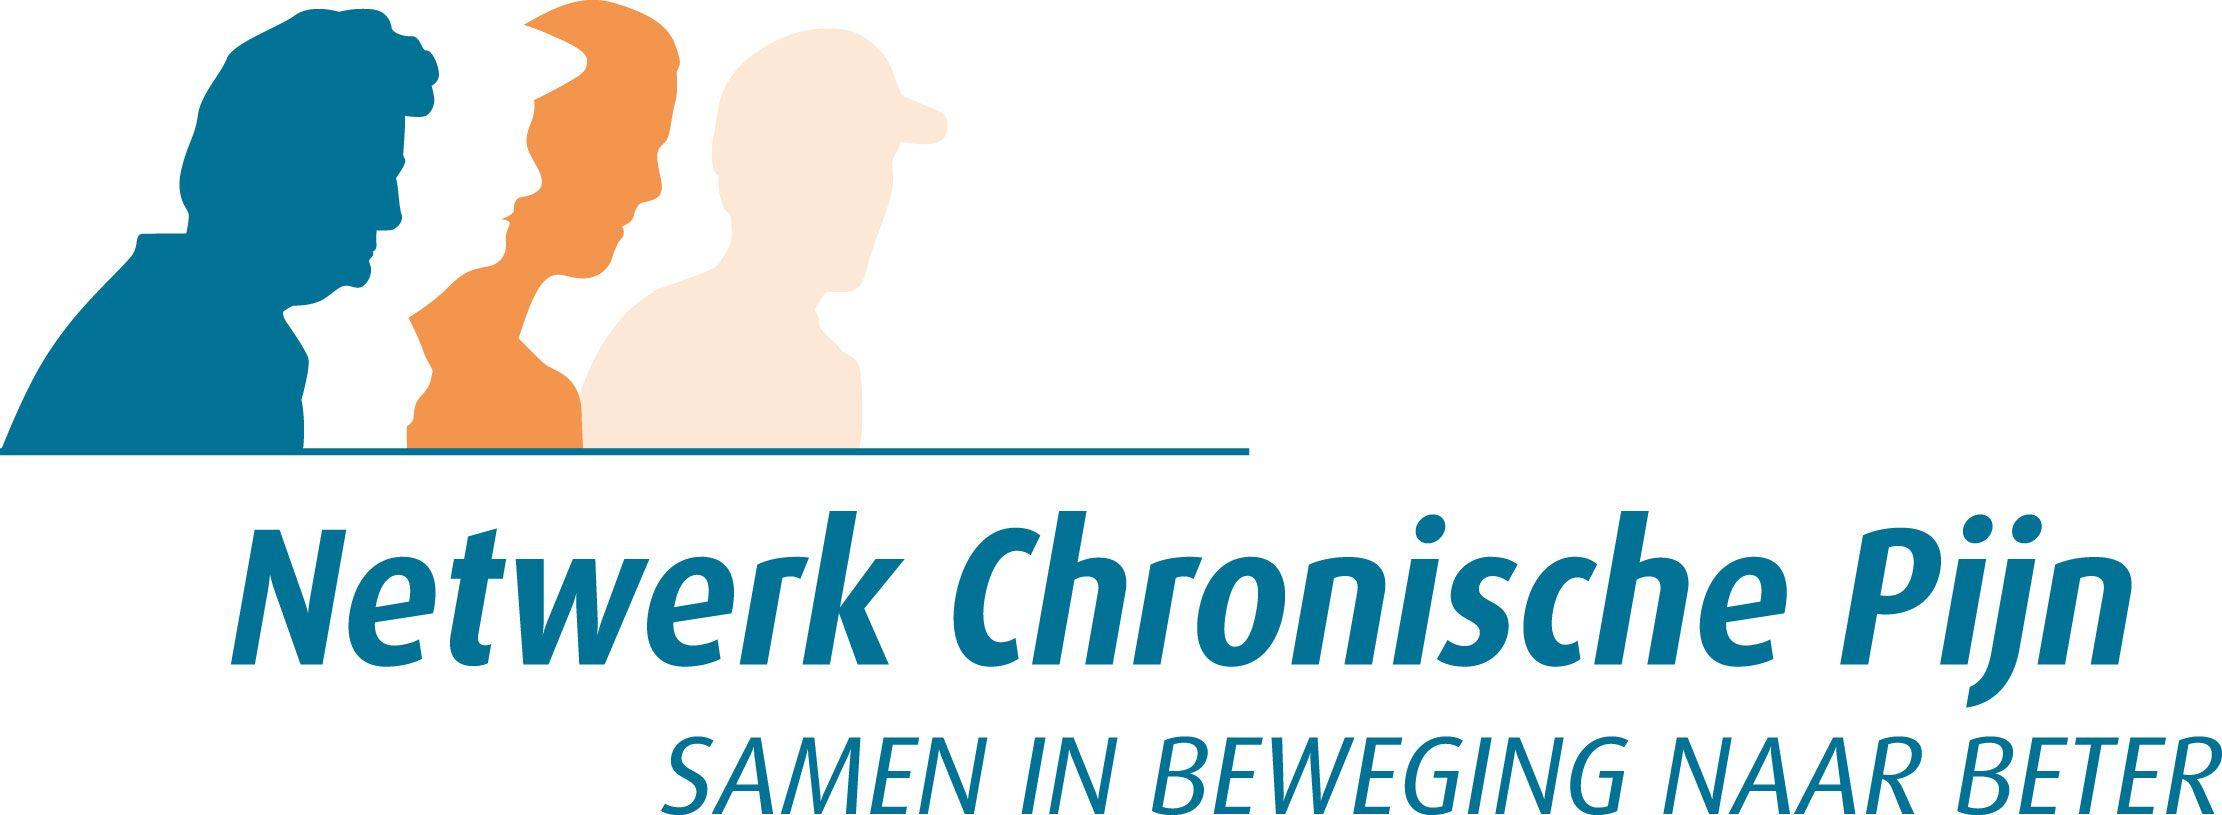 https://mensenco.nl/wp-content/uploads/2020/03/ncp_logo-300dpi-chronisch-pijn-netwerk.jpeg